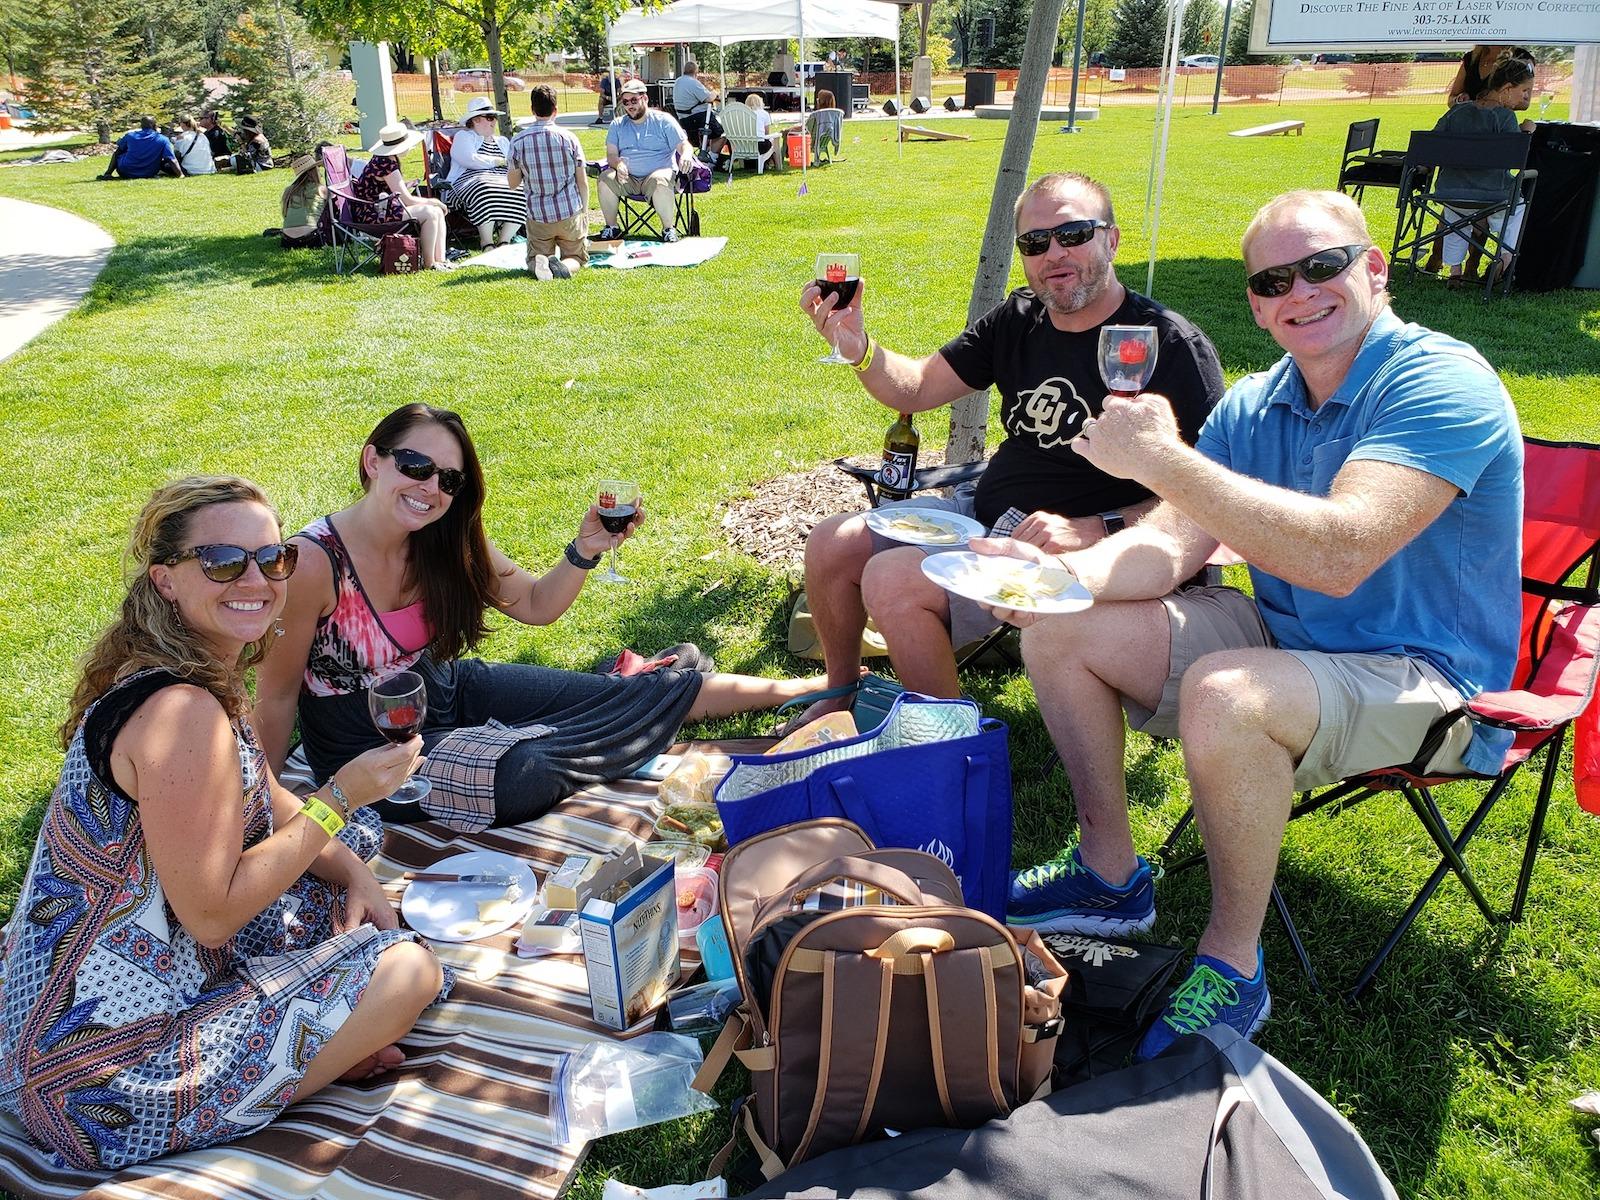 Gambar orang minum di Estes Park Wine Festival di Colorado